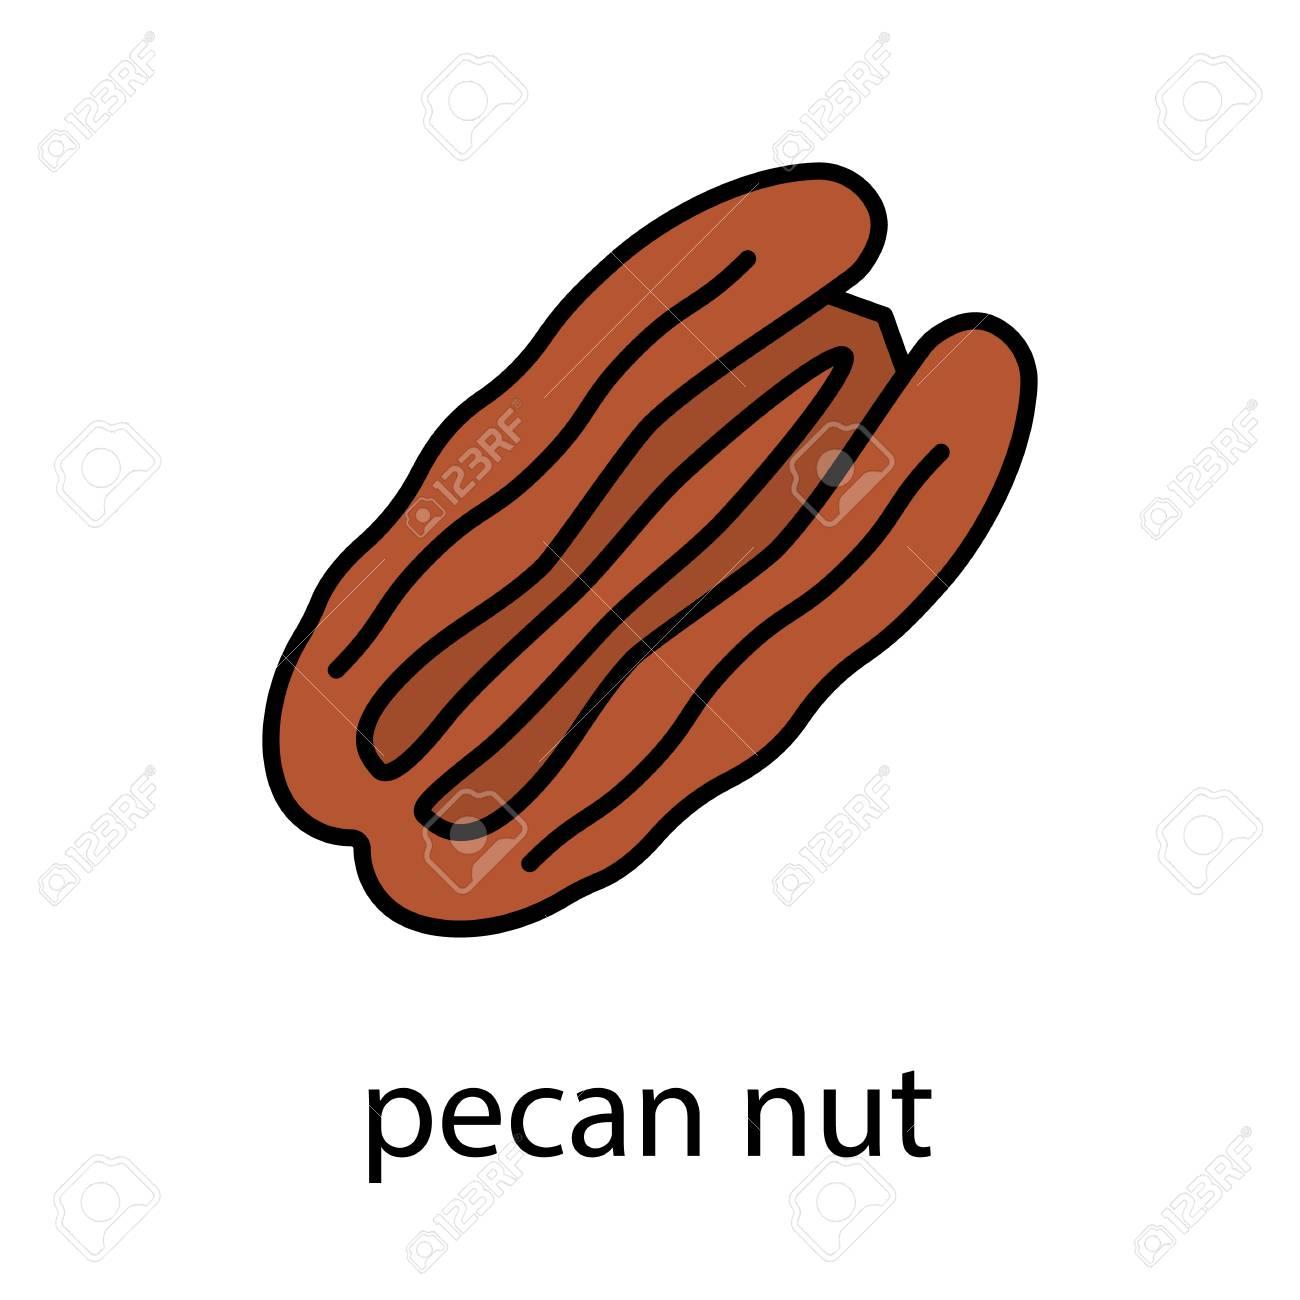 1300x1300 Nut Clipart Pecan